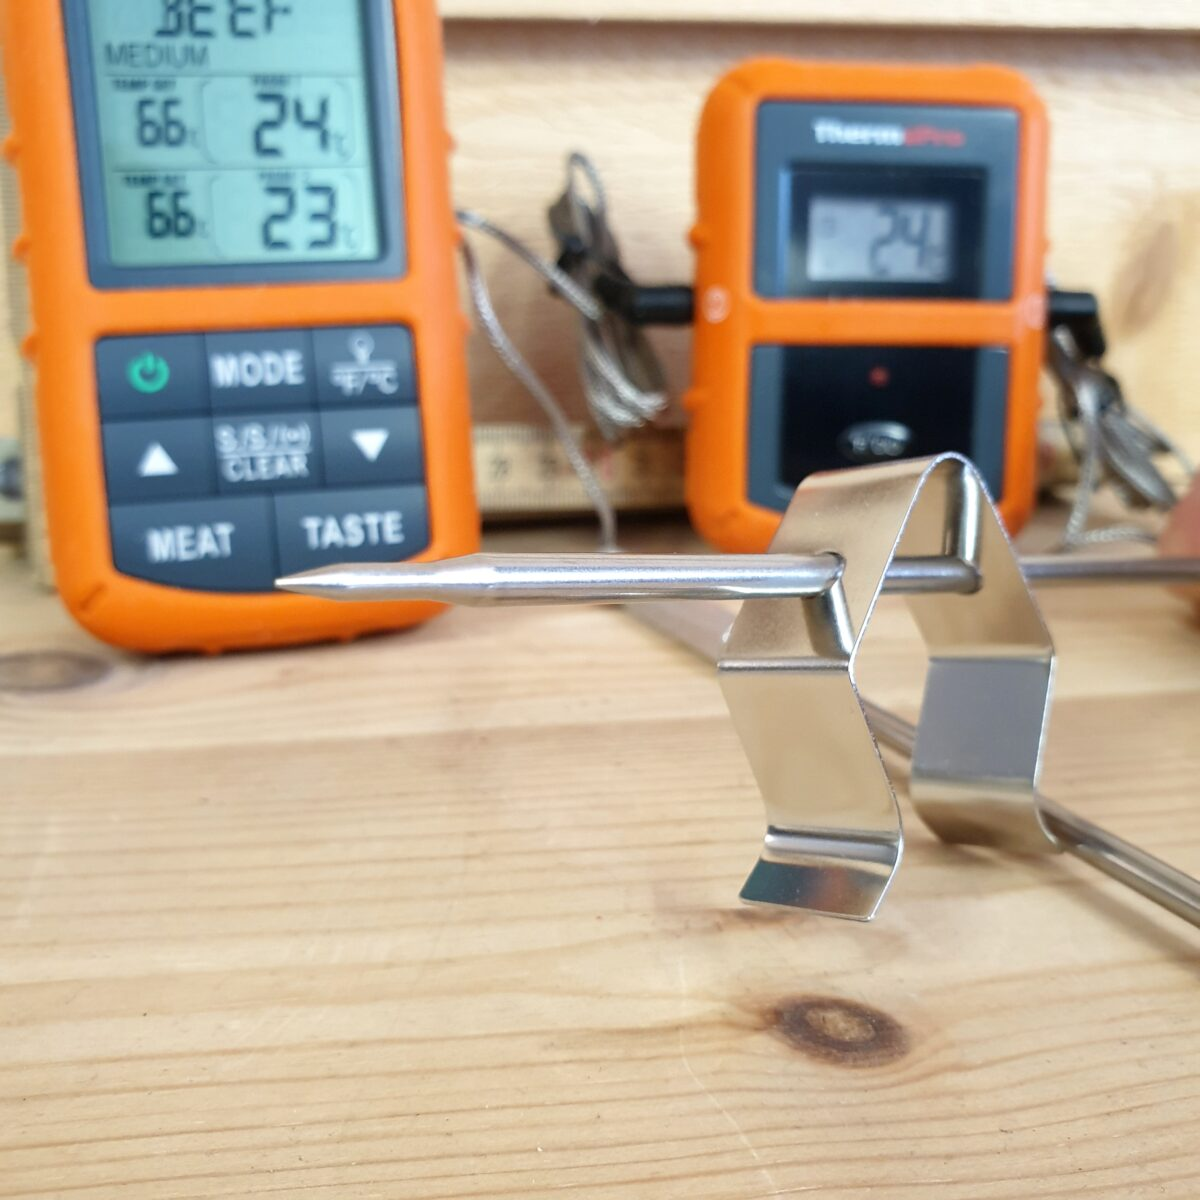 Helt nya Trådlös Grill / BBQ termometer Thermopro TP20 s med 2 givare, bra IT-12